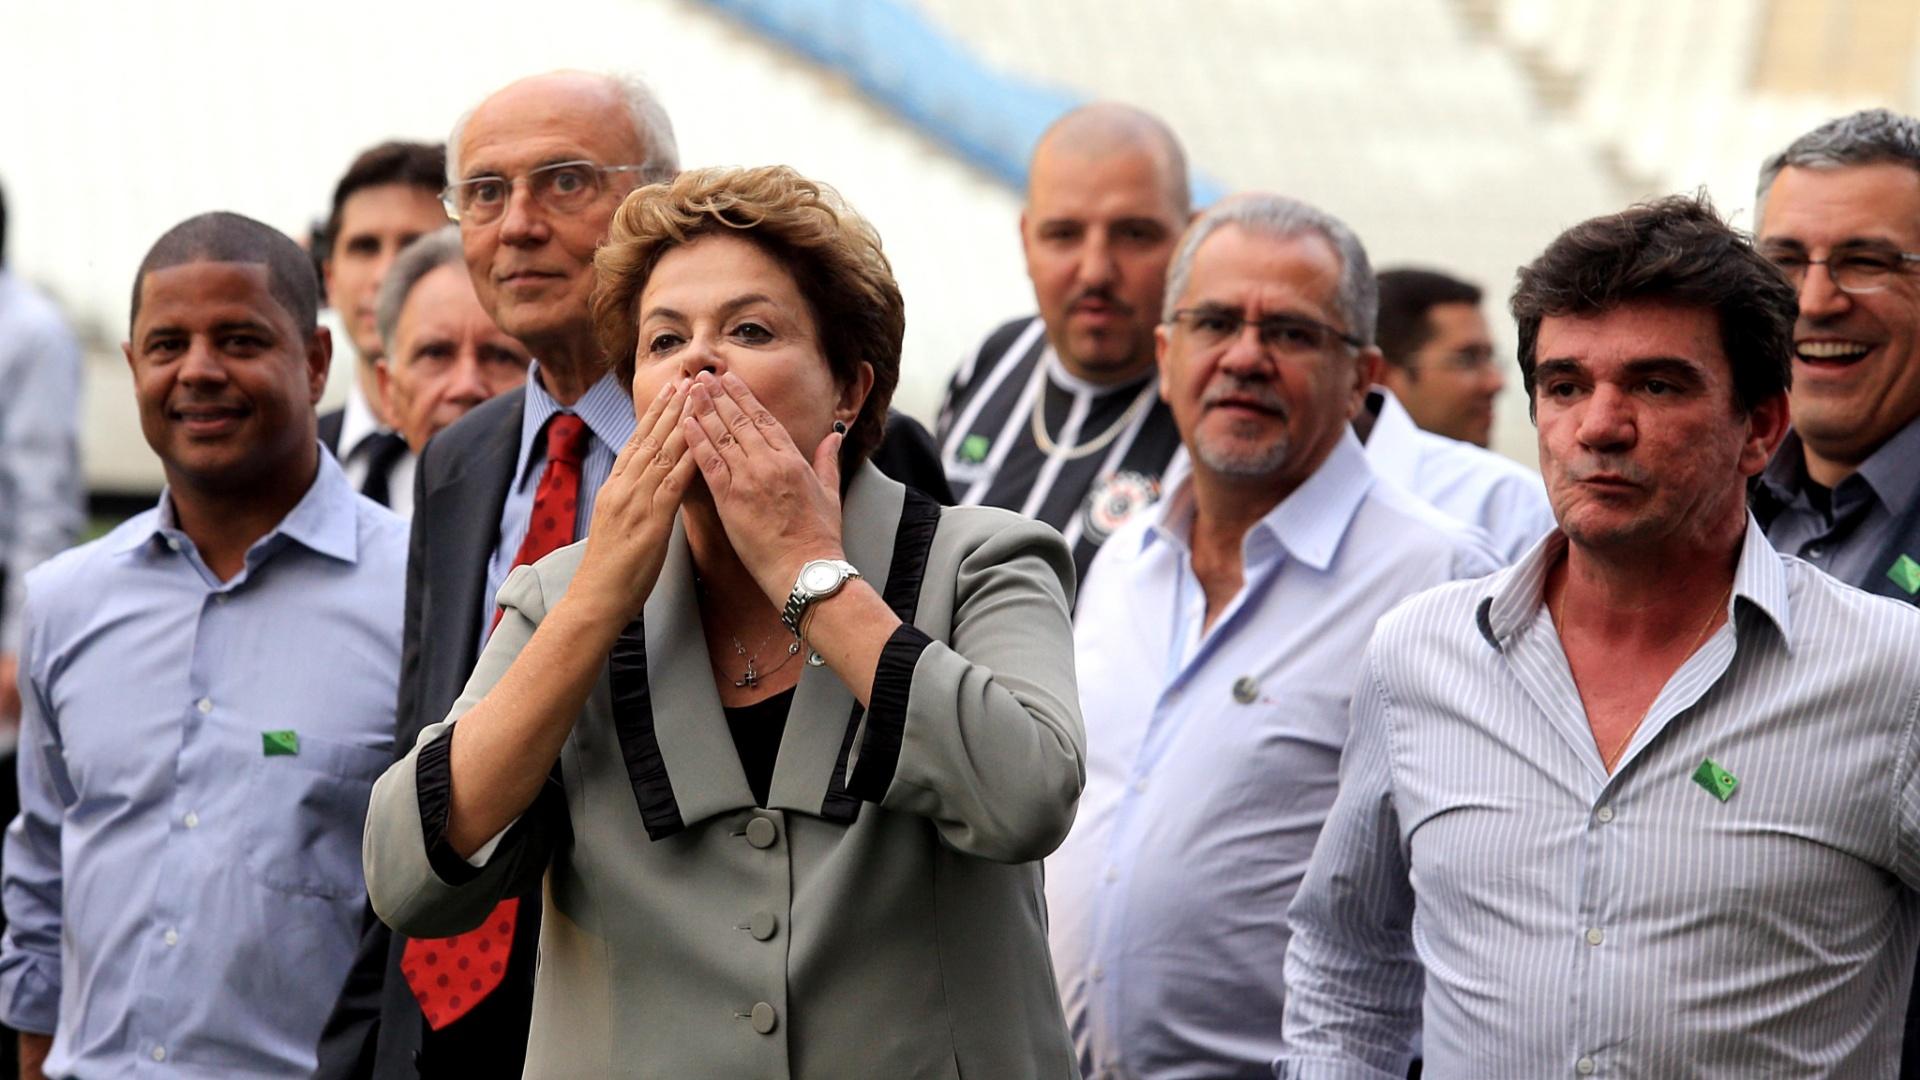 08.05.14 - Dilma Rousseff manda beijo ao lado de Marcelinho Carioca, Eduardo Suplicy, Andrés Sanchez e Alexandre Padilha